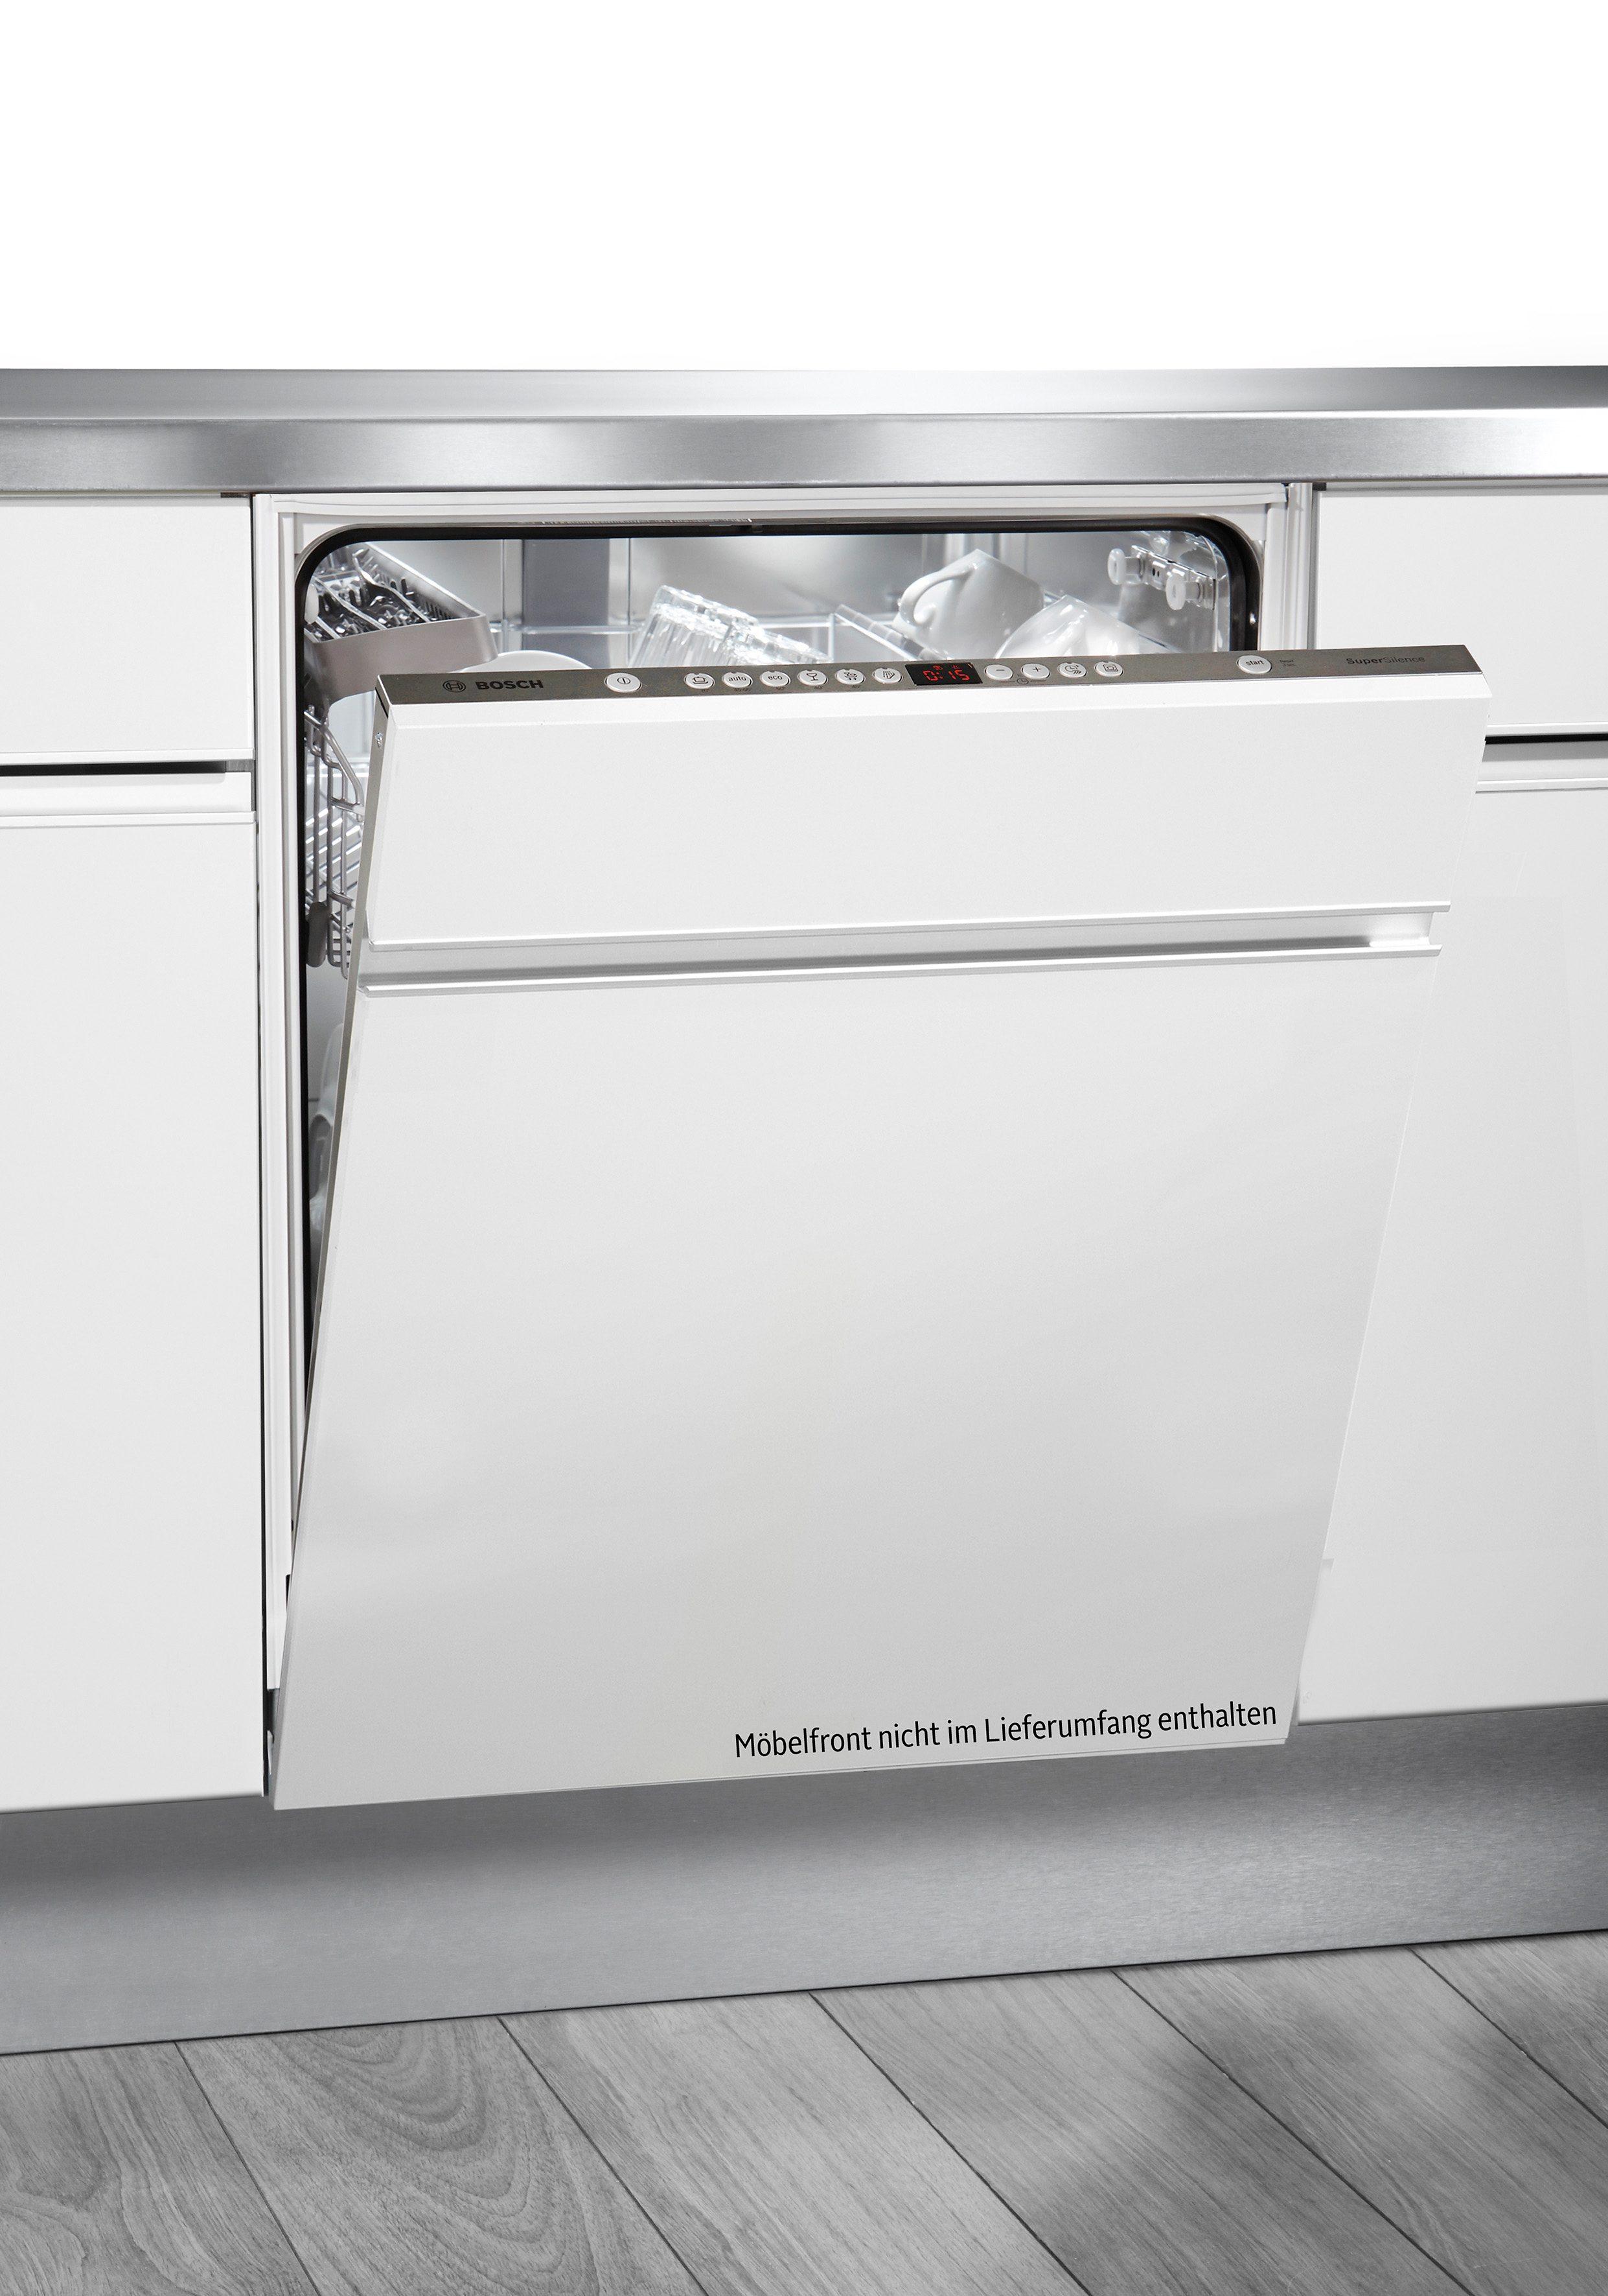 Bosch Vollintegrierbarer Einbau-Geschirrspüler SBV63N20EU, A++, 9,5 Liter, 13 Maßgedecke